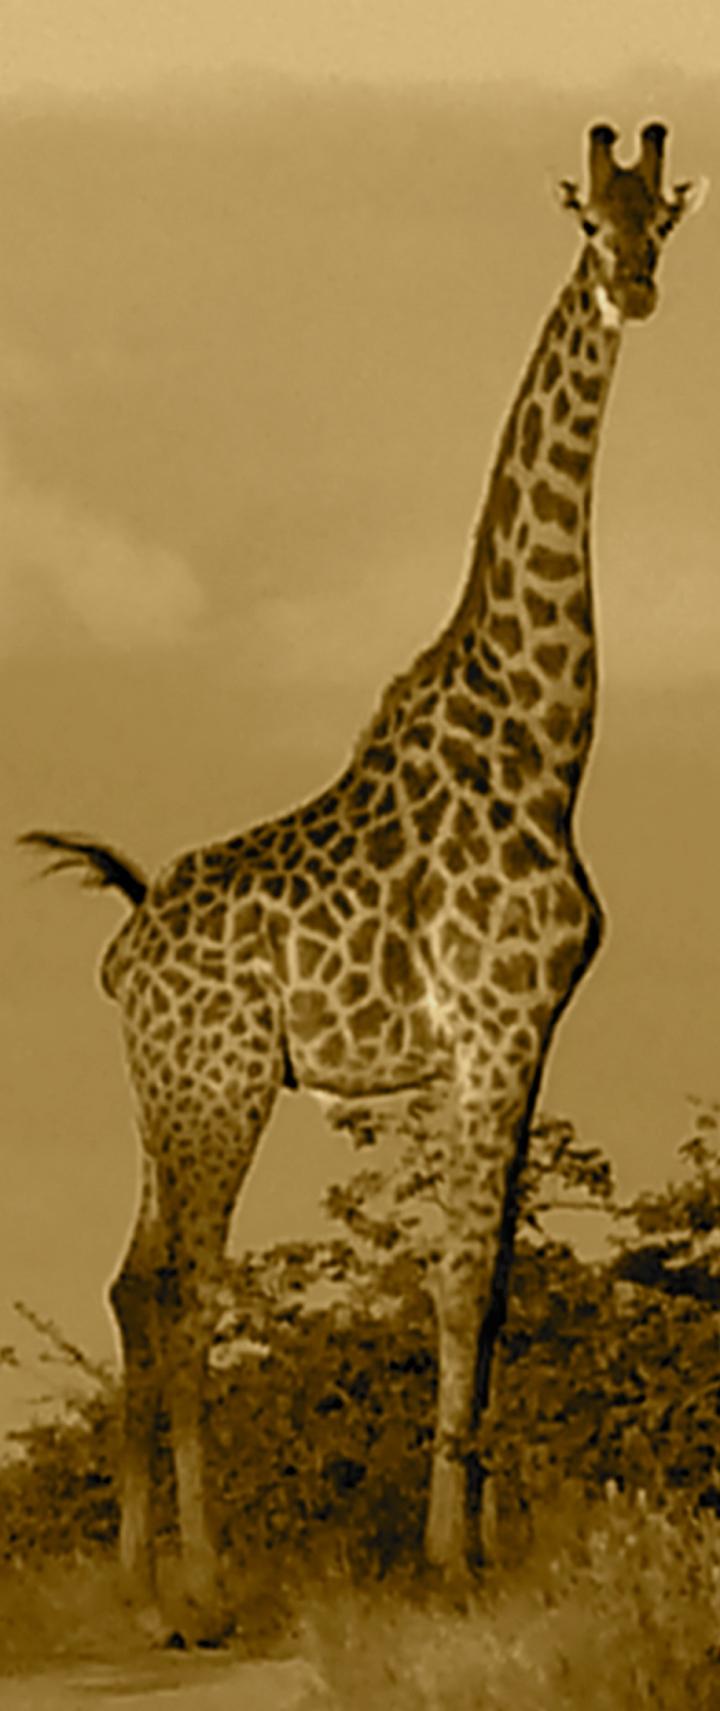 Sunset-Giraffe